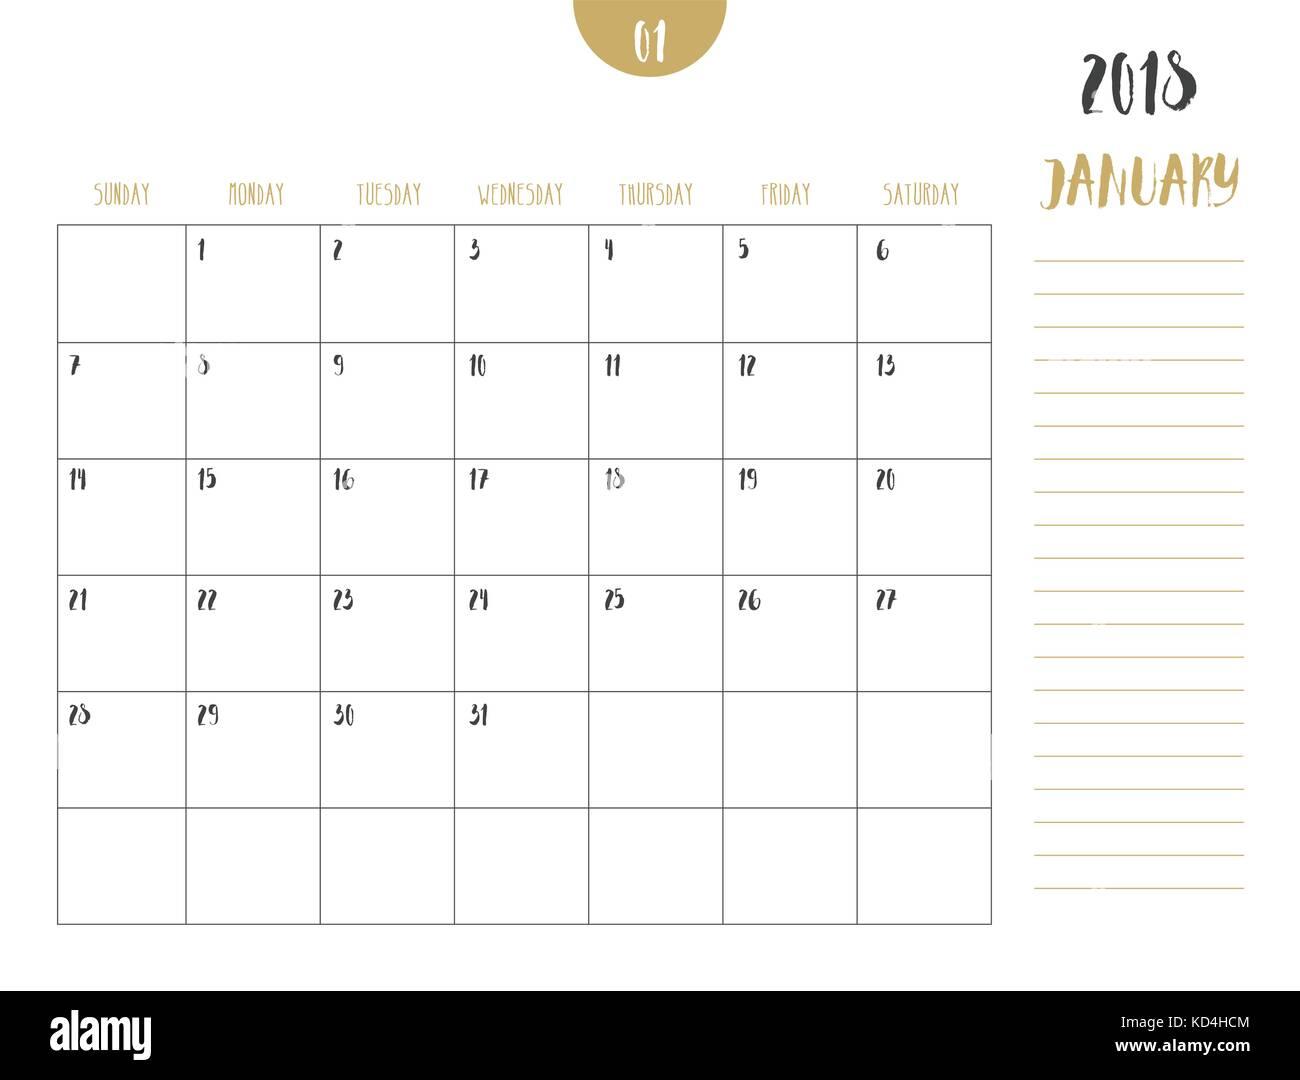 Full Moon Calendar 2018 >> 2018 Calendar Simple Vector Calendar Stock Photos & 2018 Calendar Simple Vector Calendar Stock ...